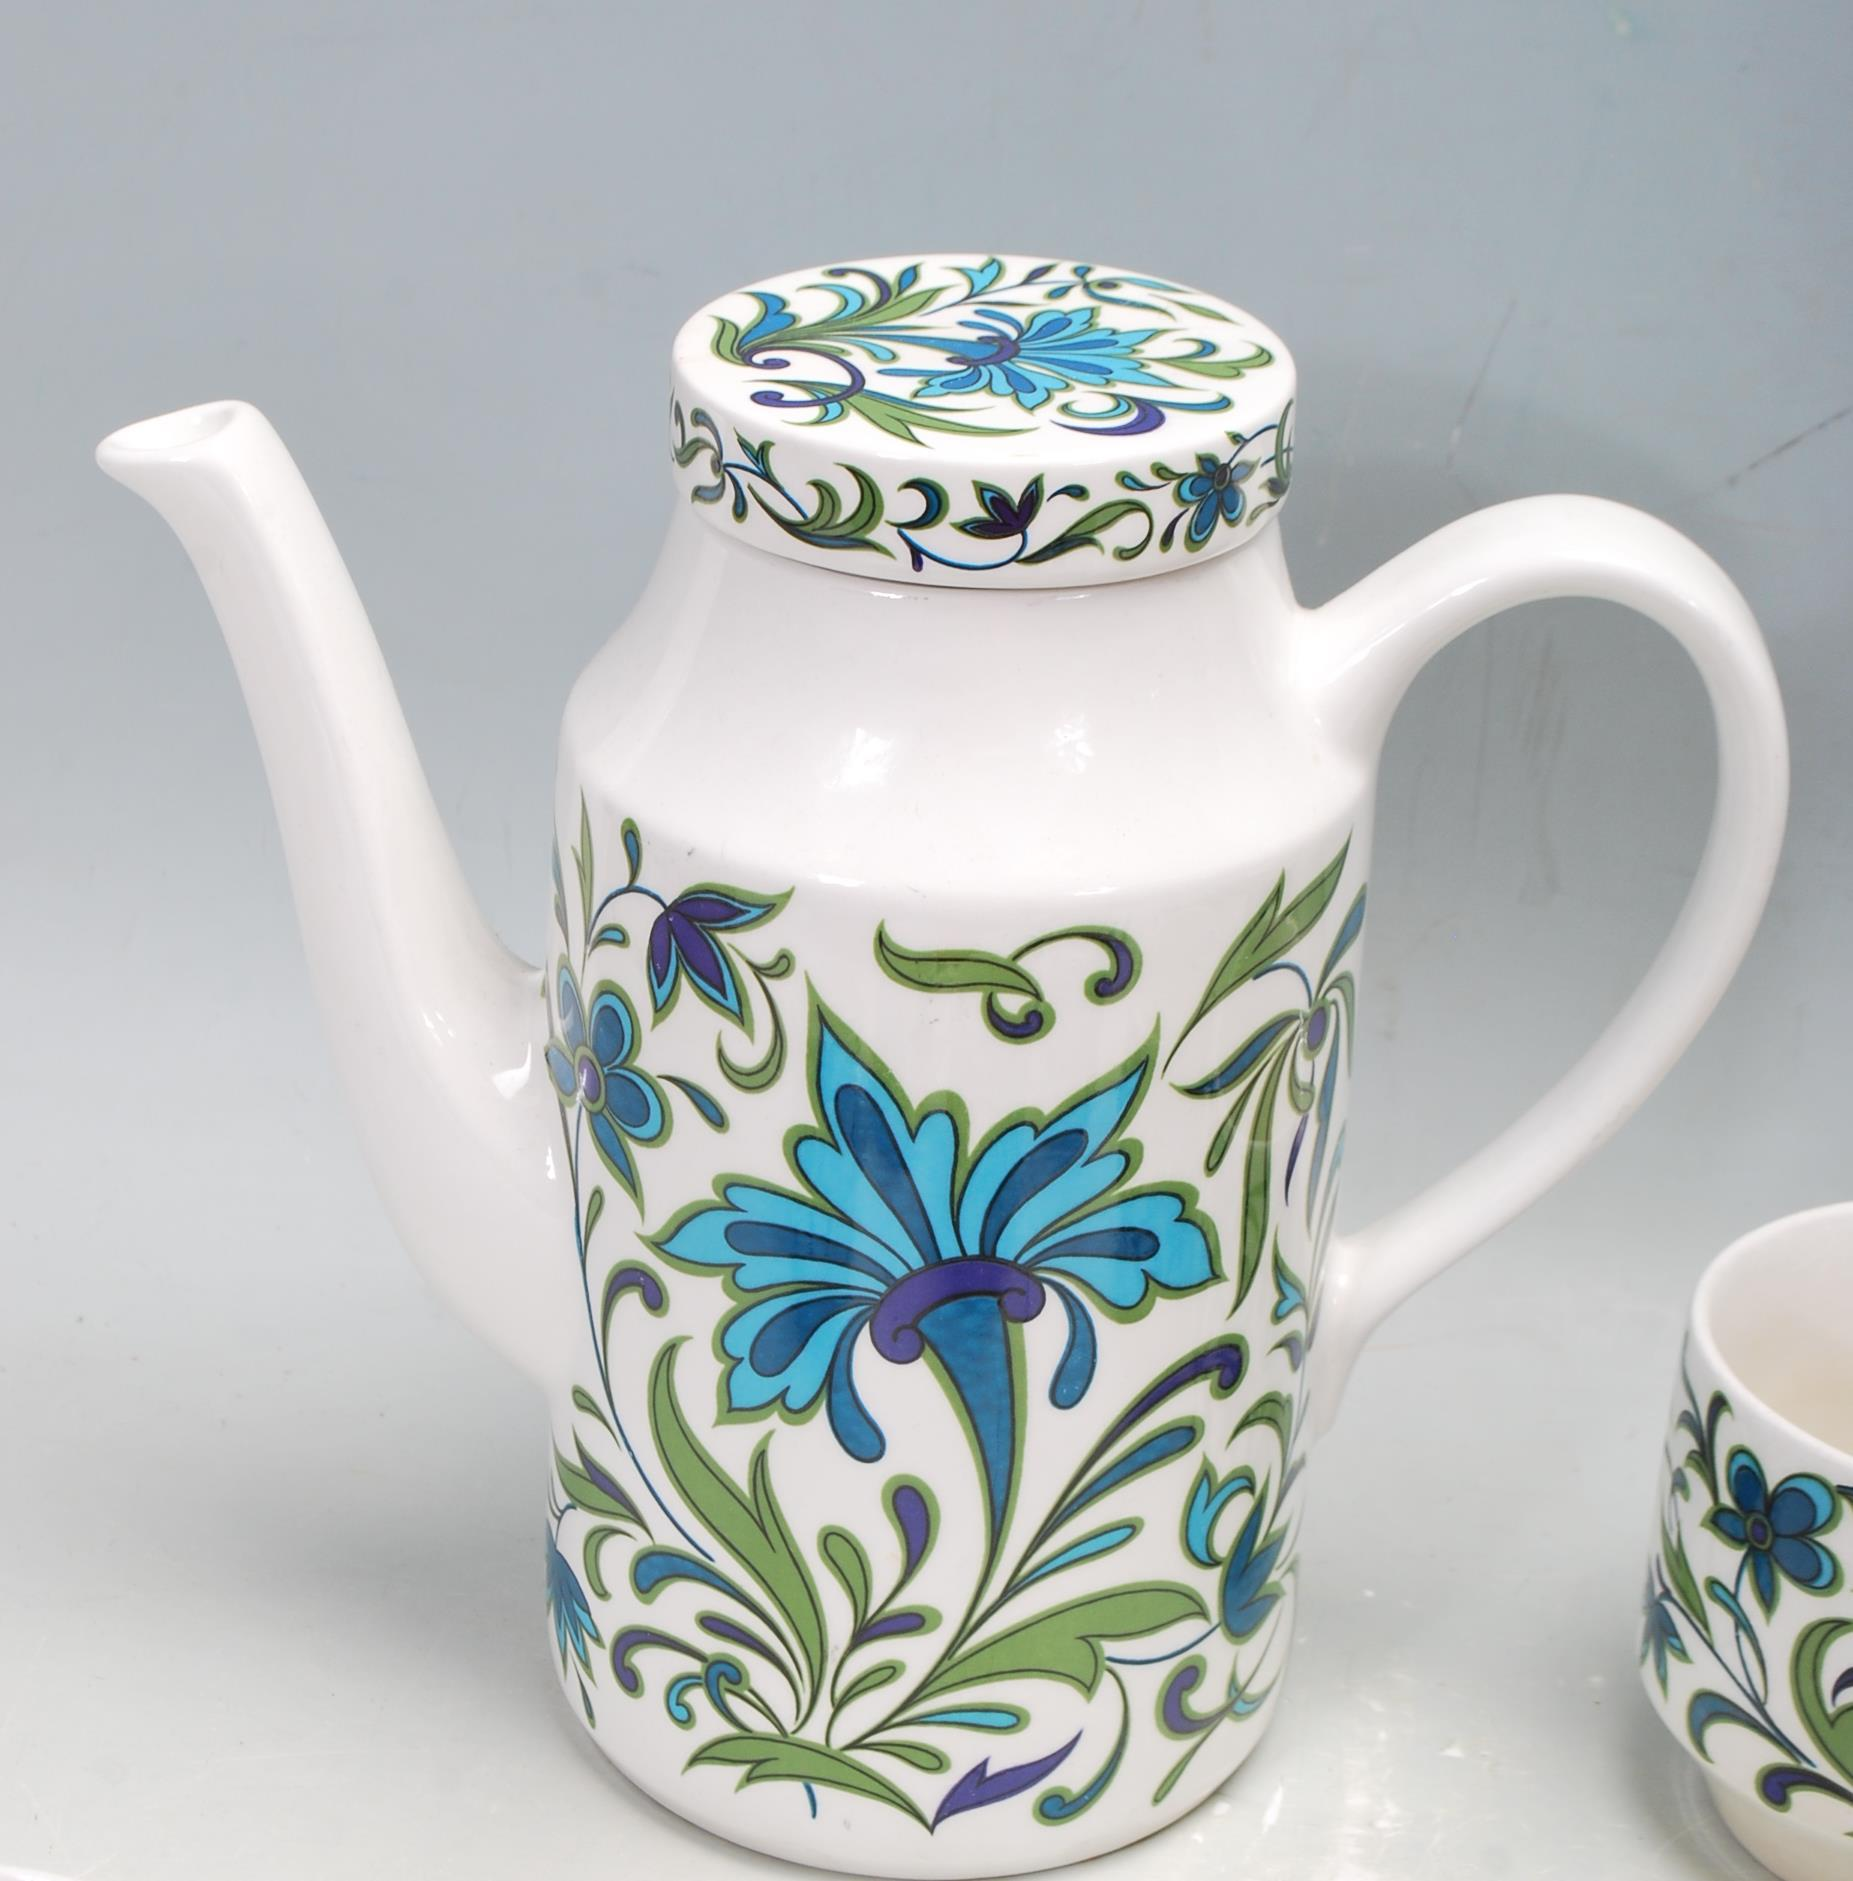 RETRO VINTAGE MID 20TH CENTURY MIDWINTER SPANISH GARDEN TEA SERVICE - Image 6 of 7